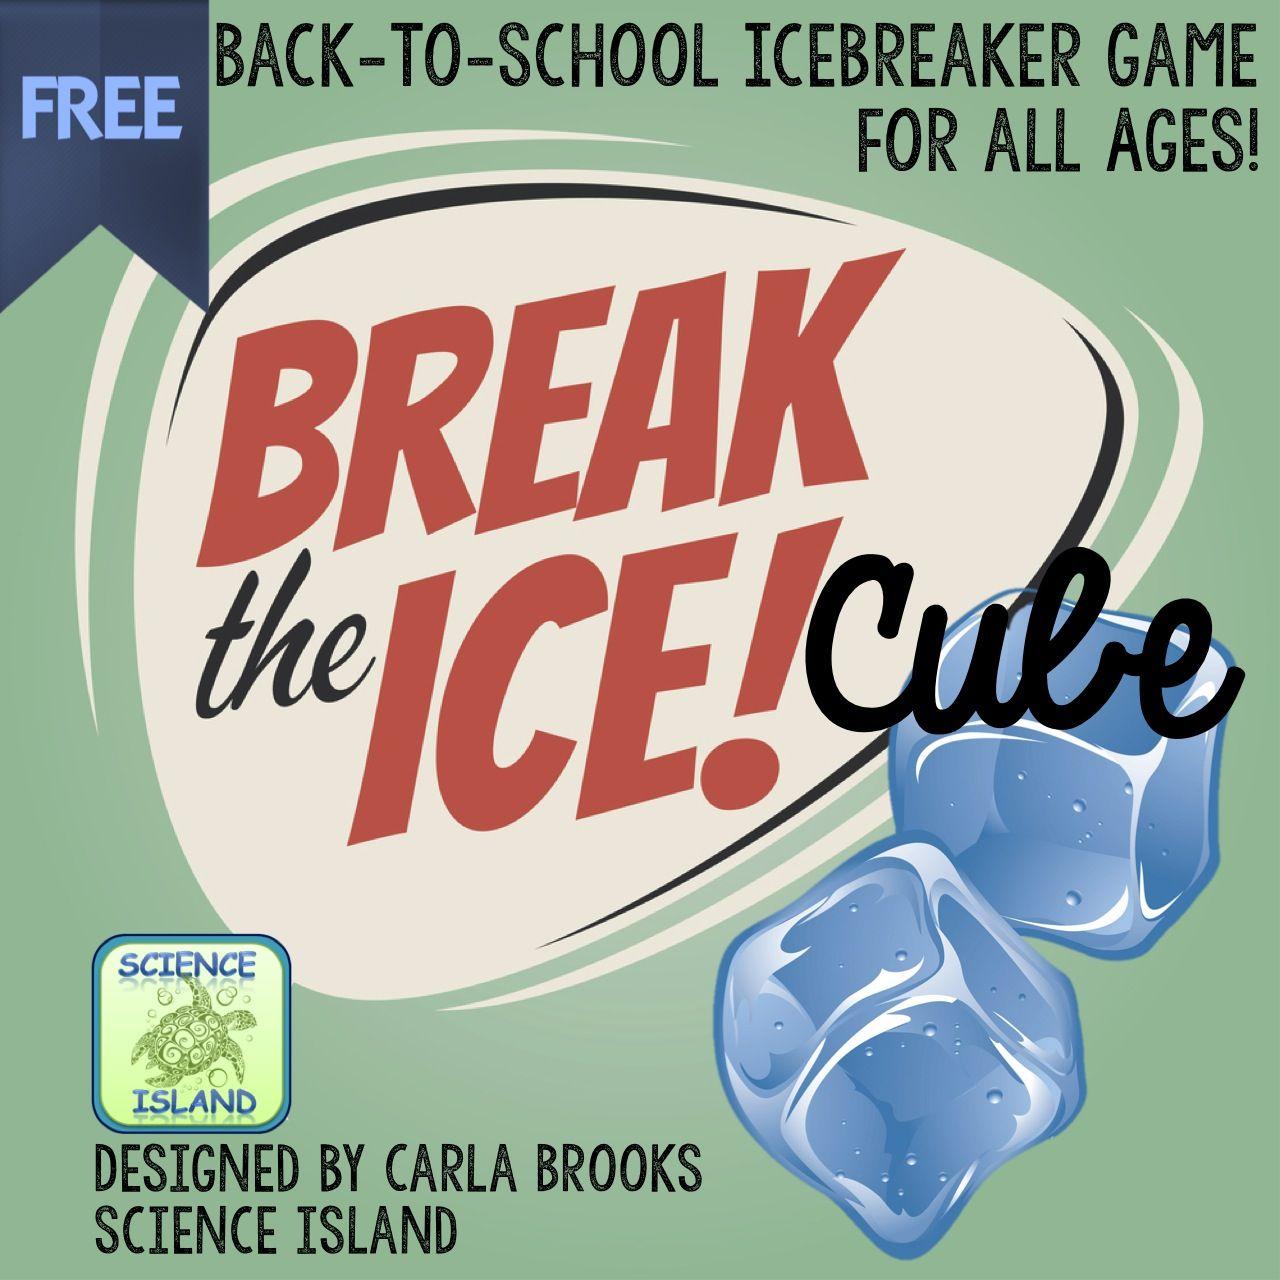 Break The Ice Cube Game Back To School Icebreaker